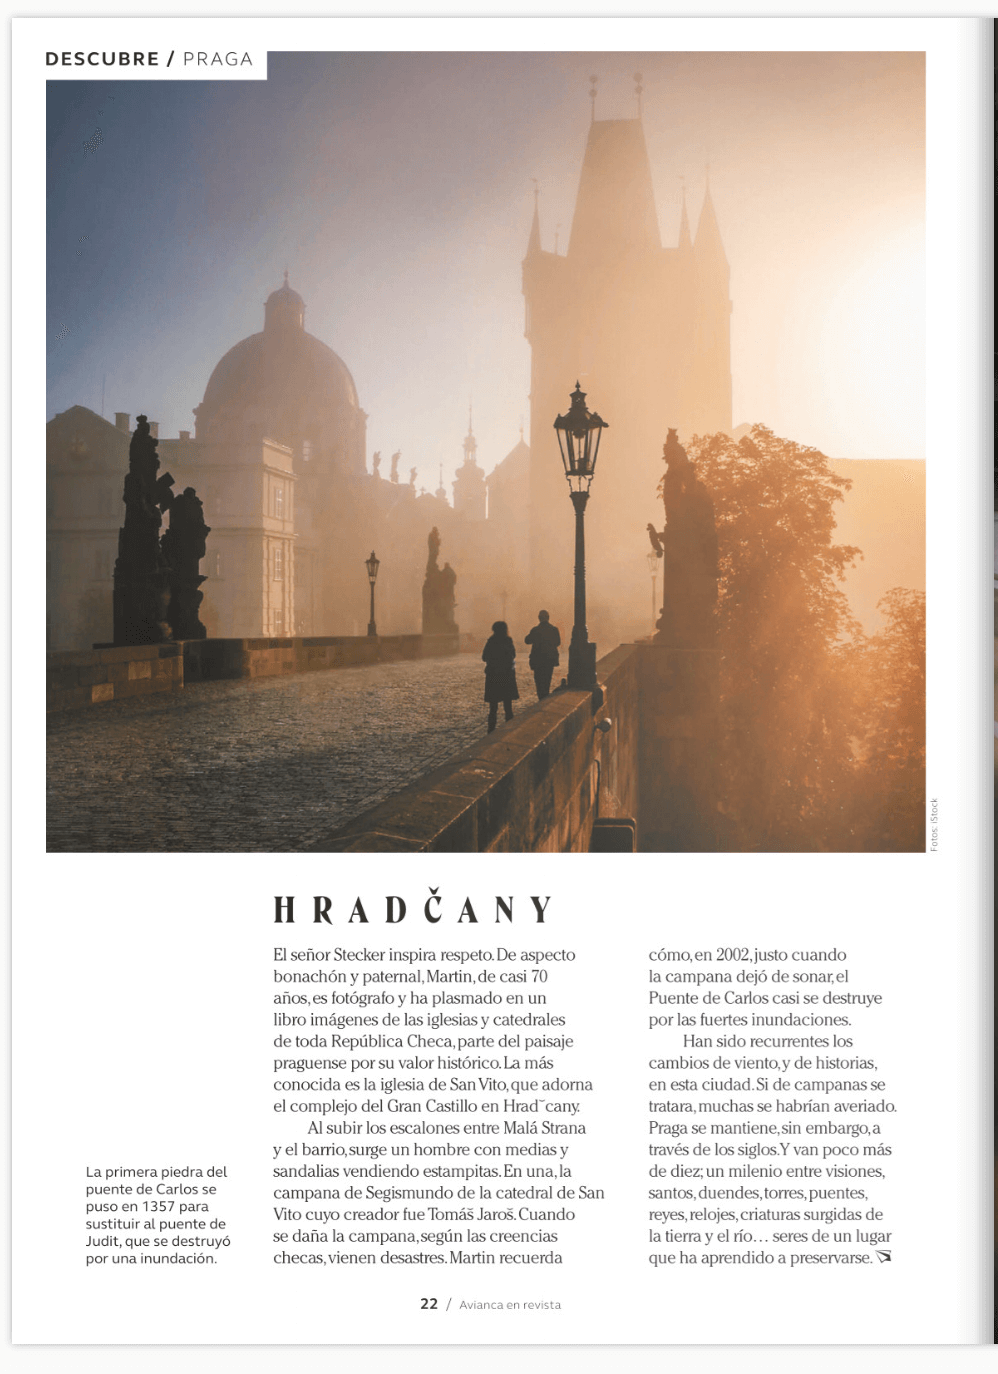 Avianca En Revista_Juan Calderon Ardila_13